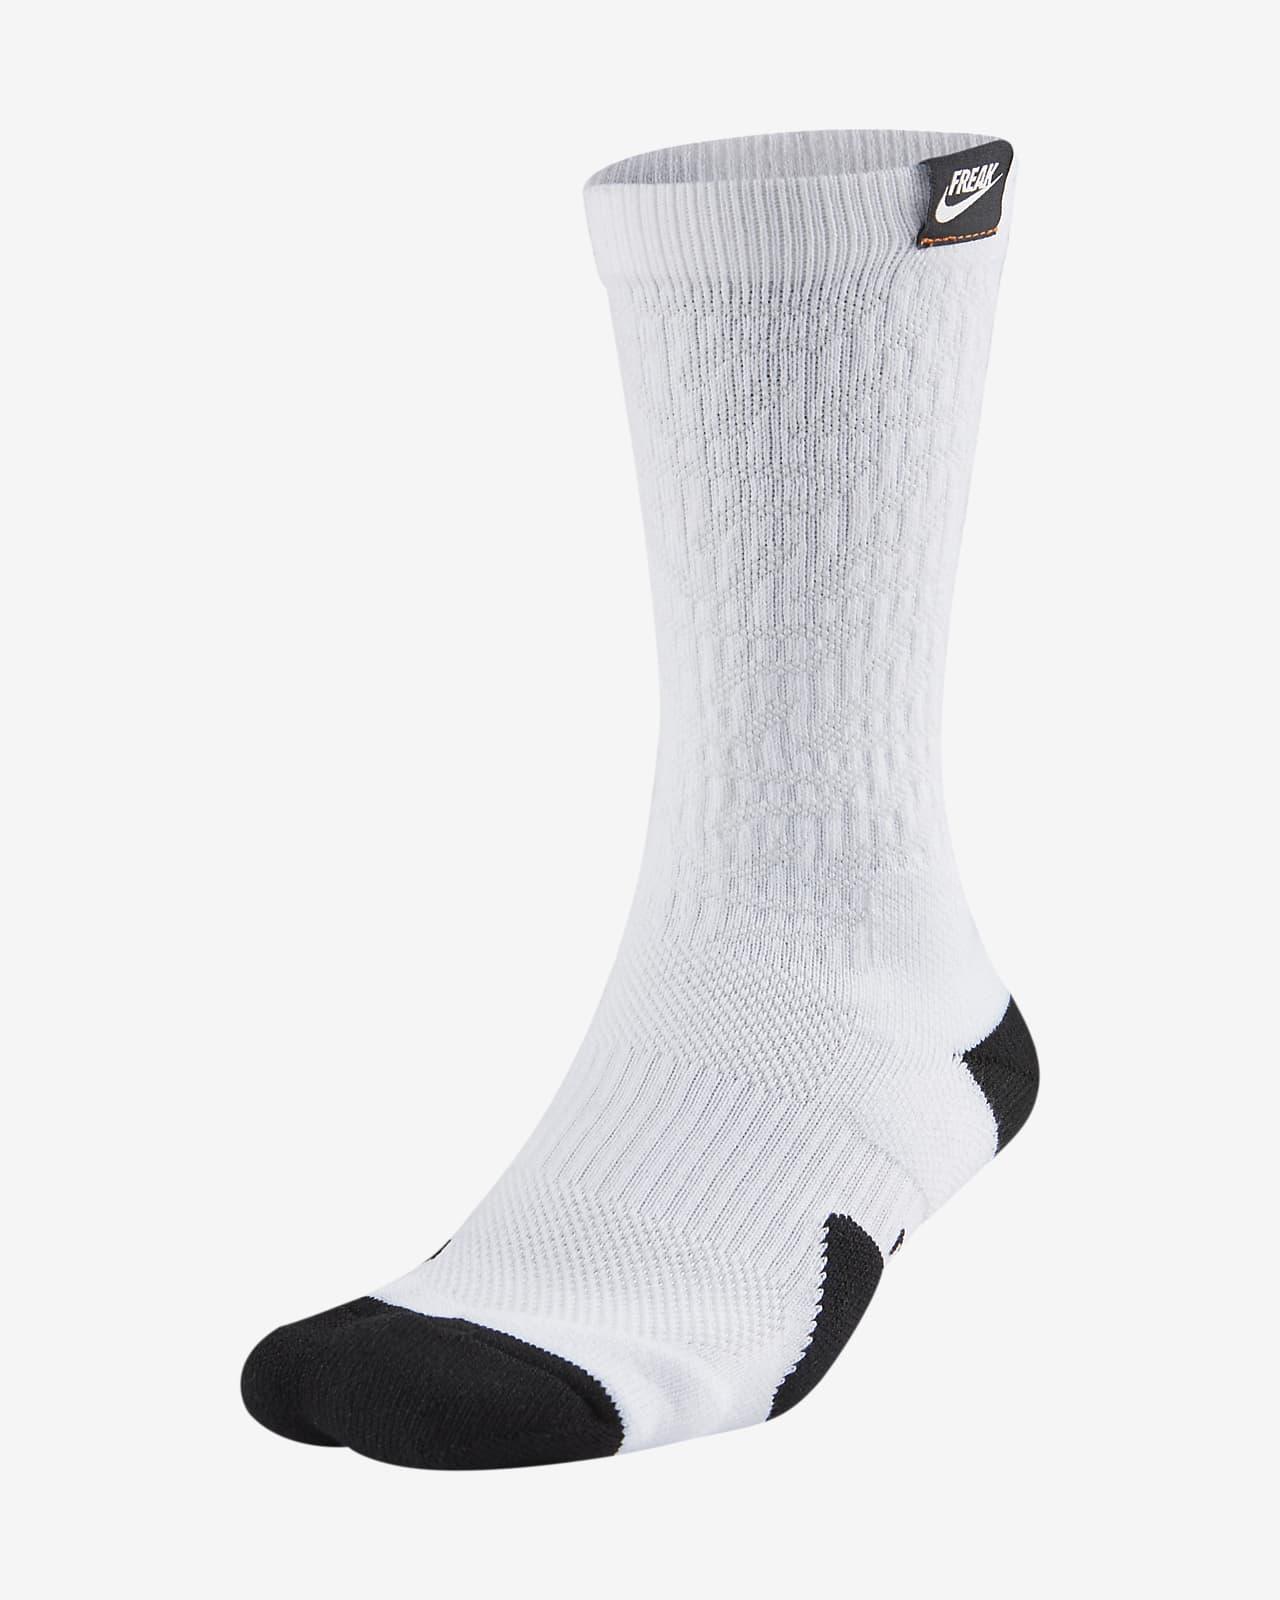 Chaussettes de basketball mi-mollet Nike Elite Giannis